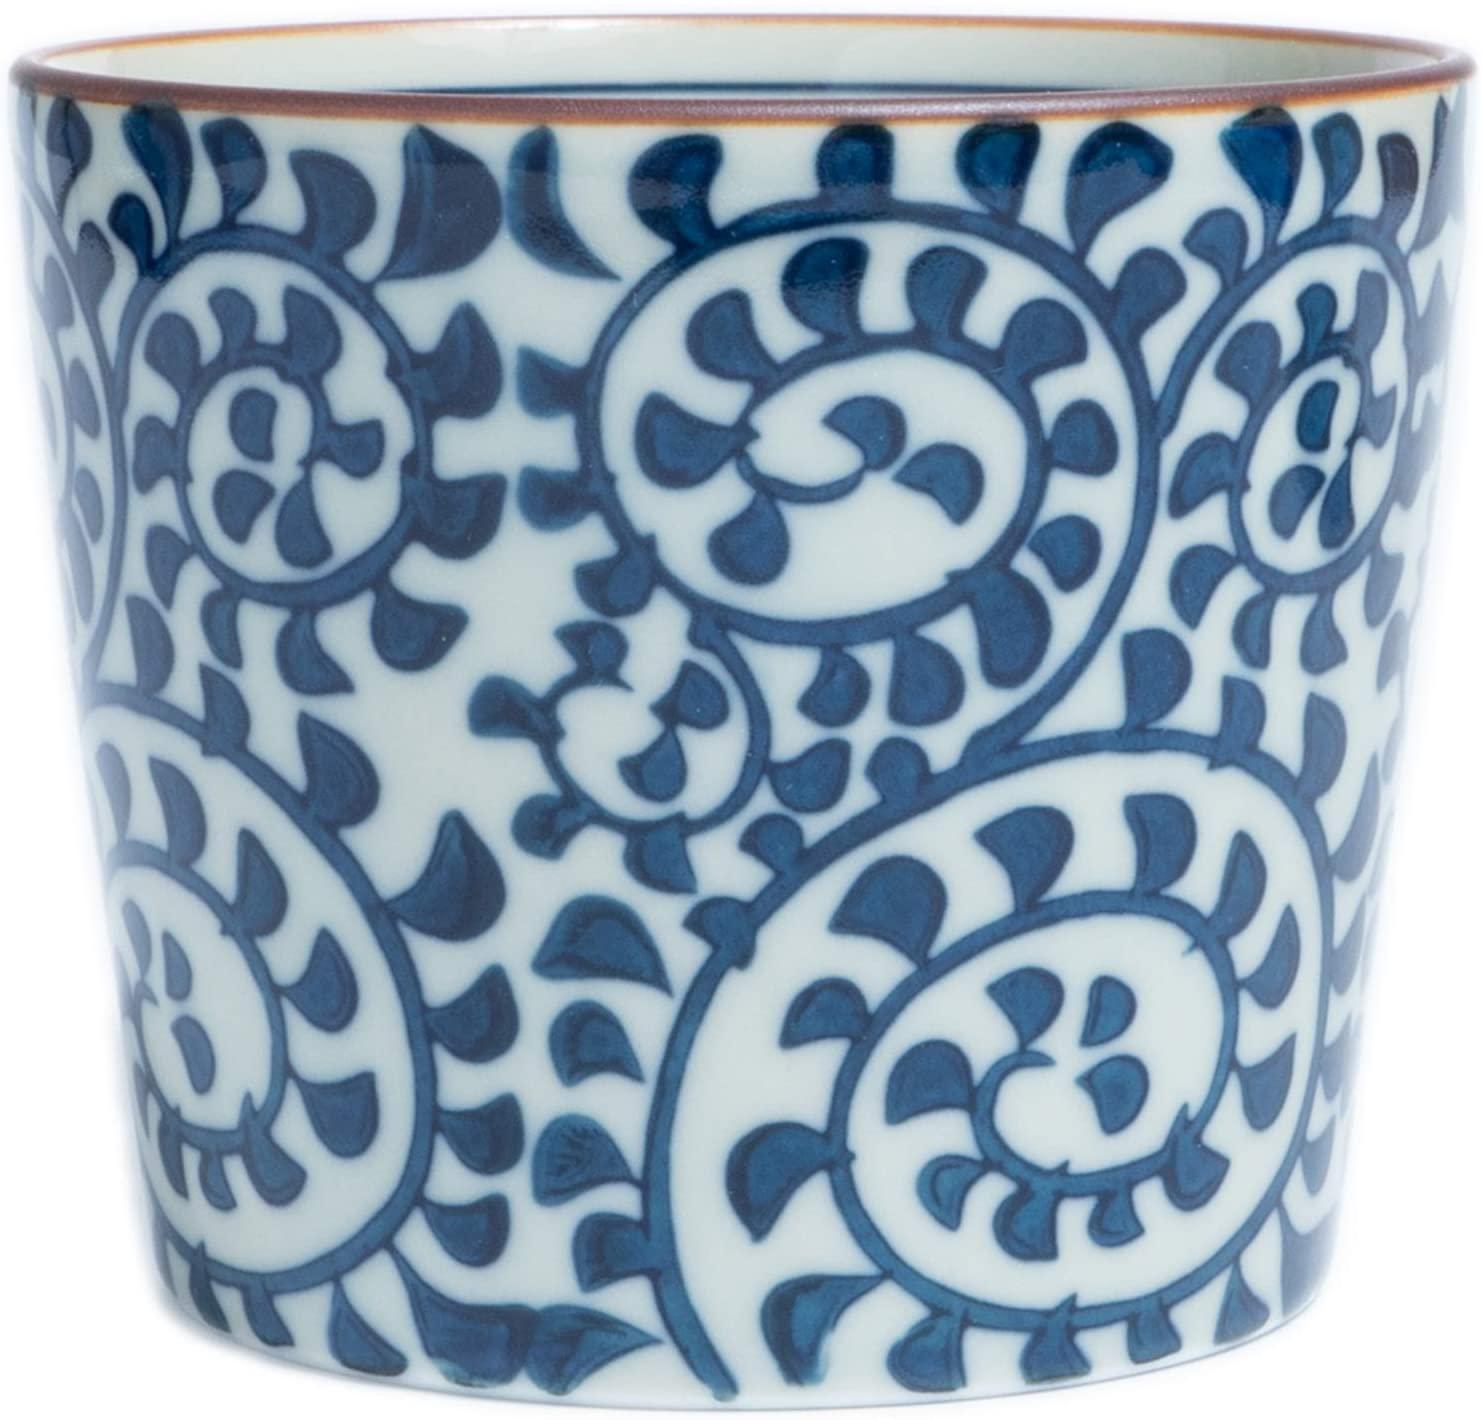 Sobachoko Tea Cup HASAMI YAKI Ceramic Pottery KARAKUSA Arabesque 7.0oz Dinnerware Sake Dessert Cup Made in Japan